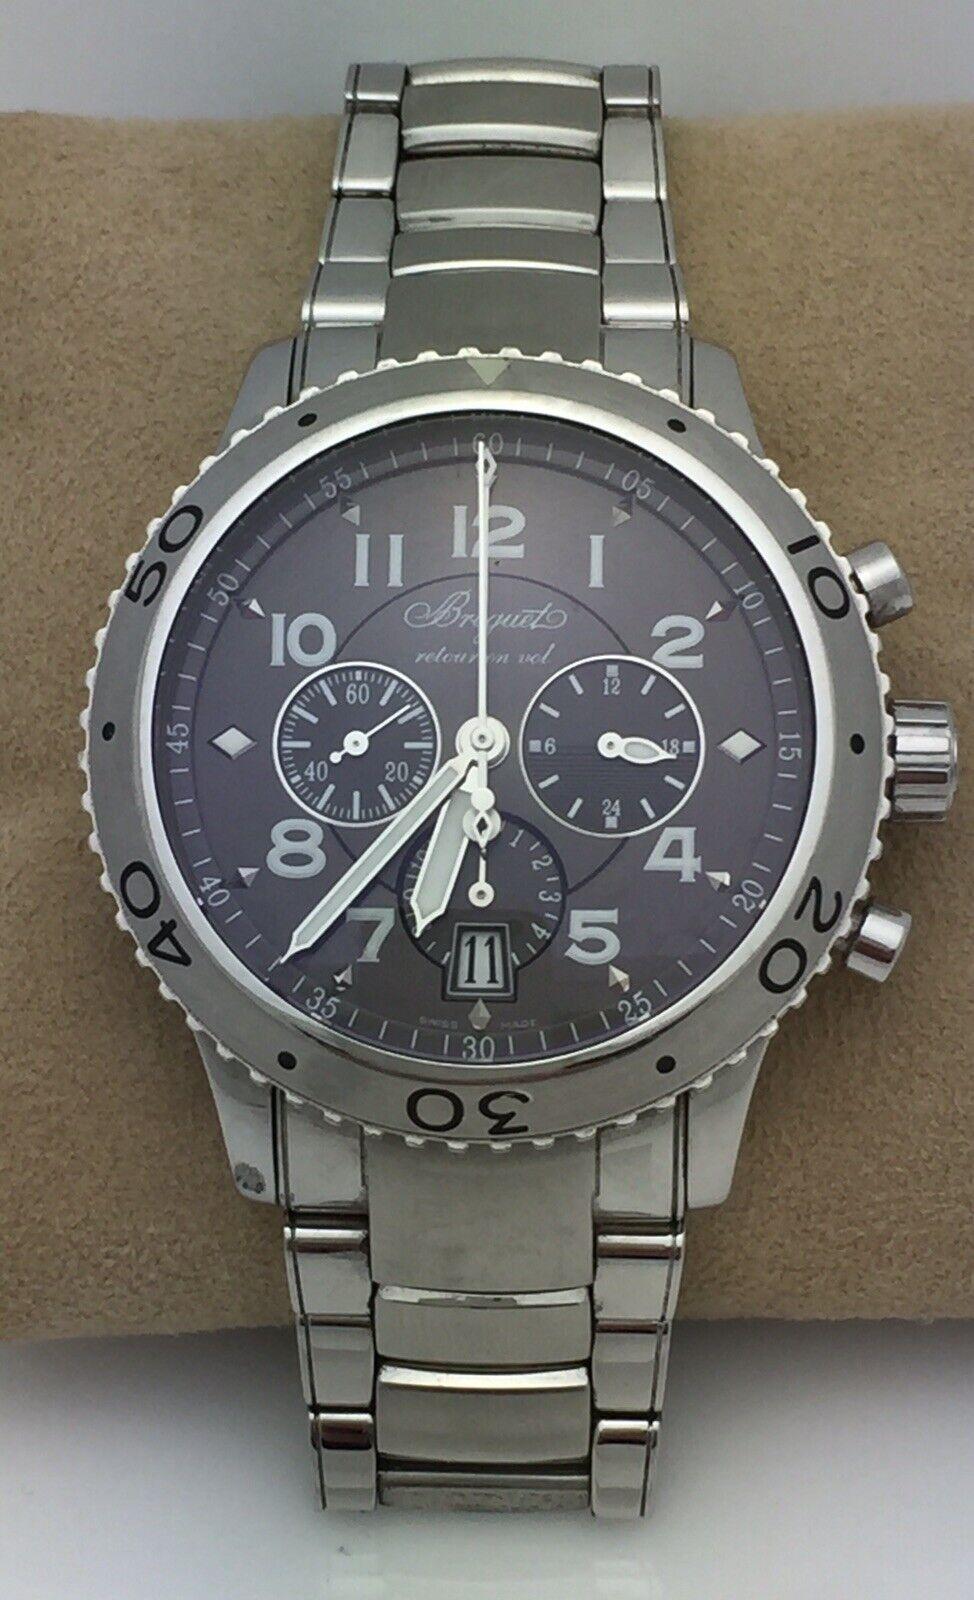 Breguet Transatlantique Type XXI Flyback Chronograph 3810 Mans Watch - watch picture 1